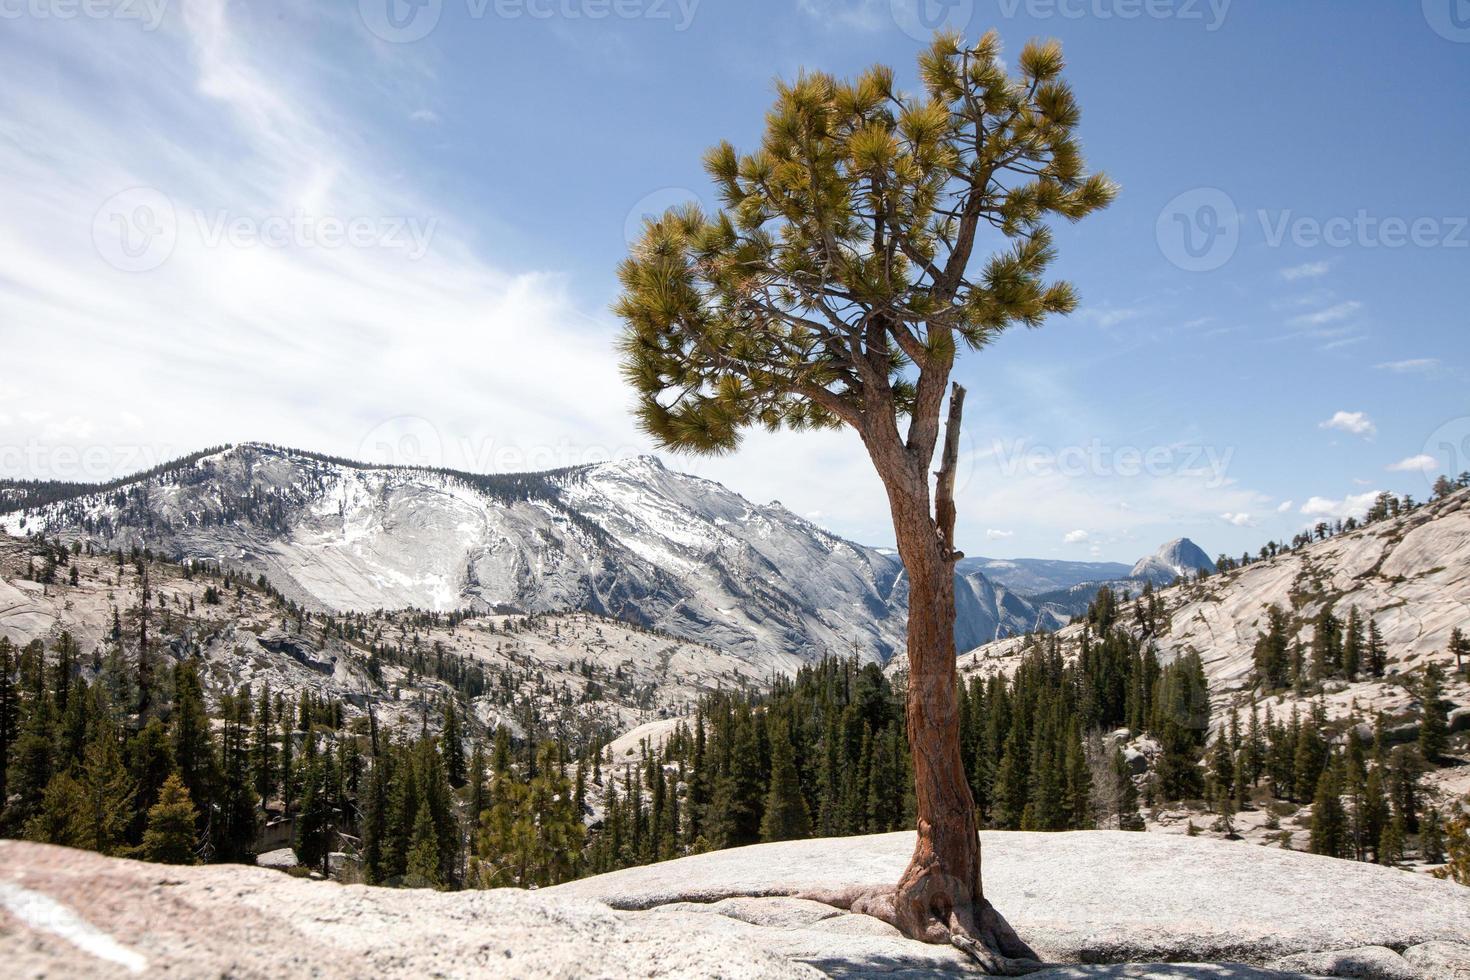 Pine on Rock in Yosemite photo